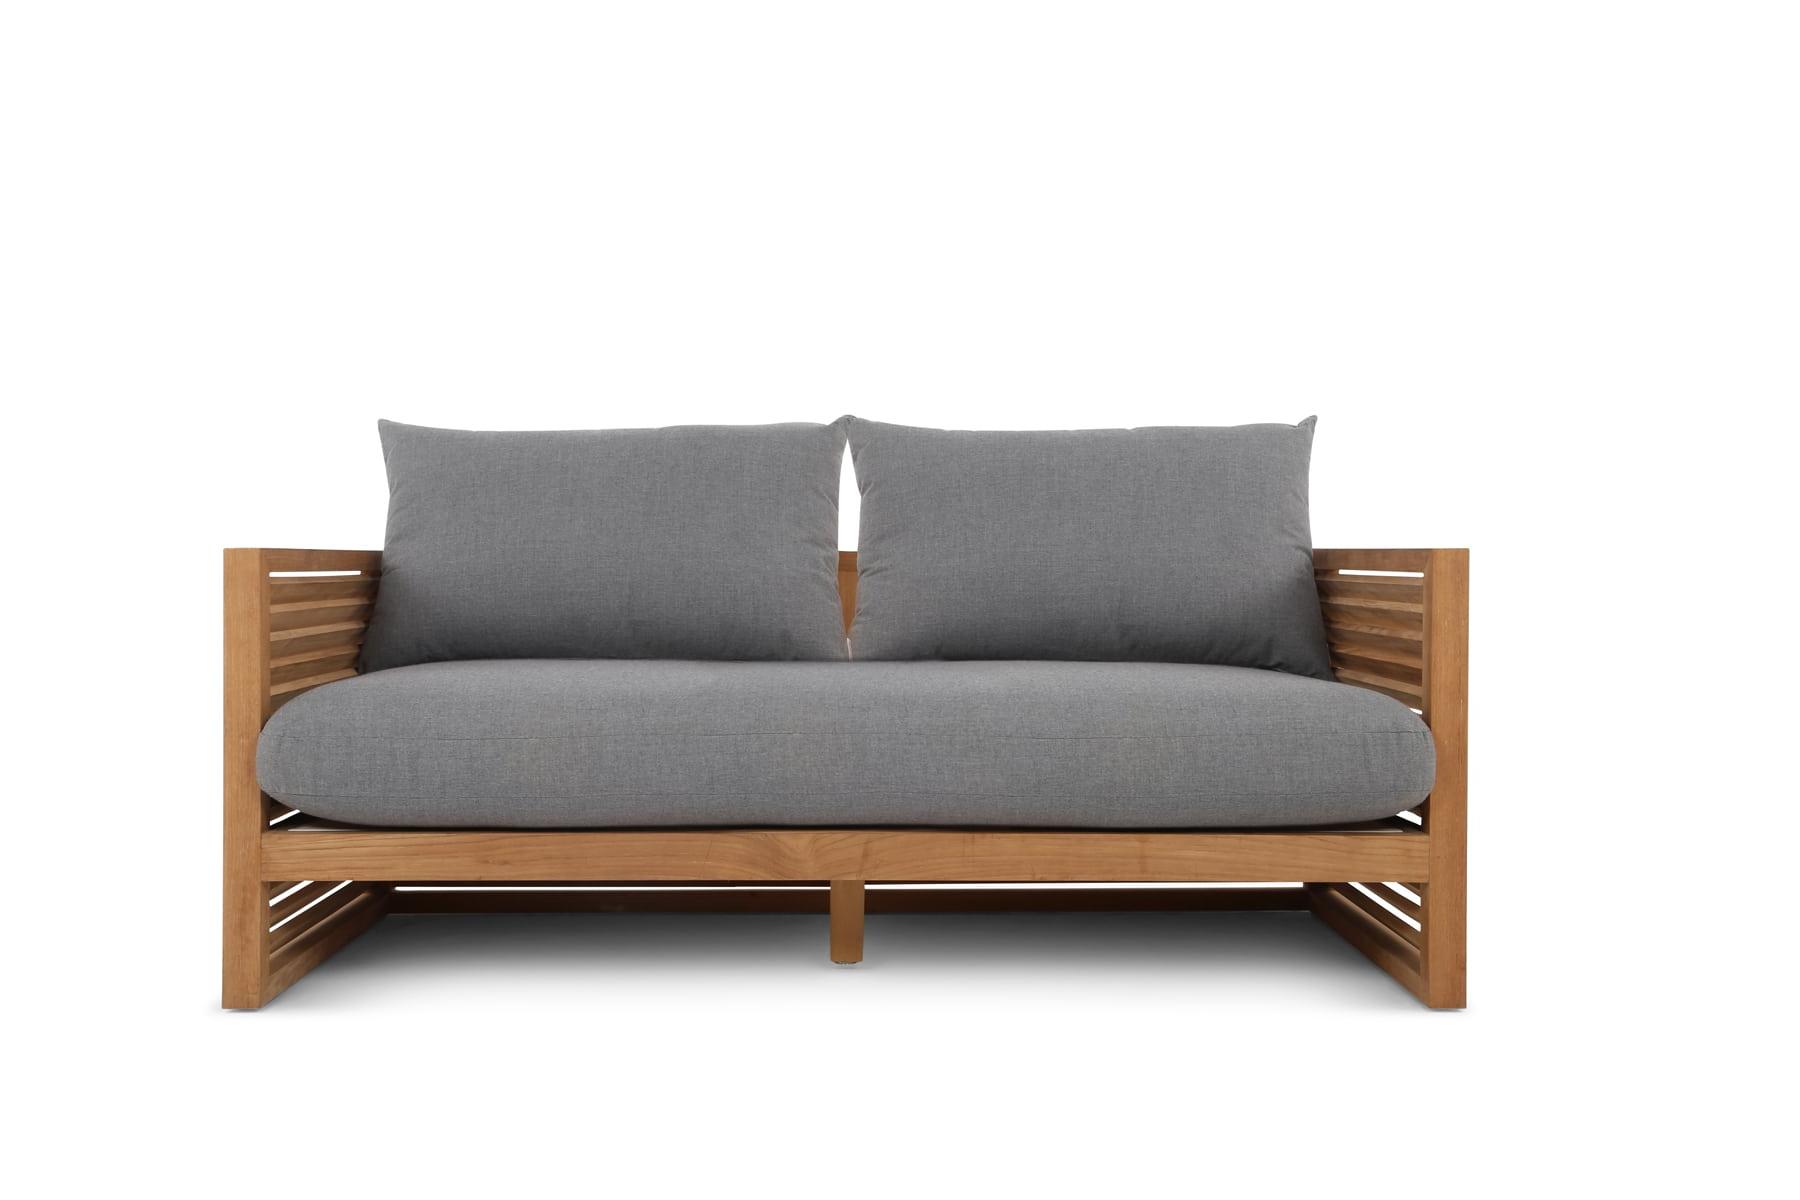 Gebraucht Couchtisch Patio Sofas Sofa Teak Danish Cushions With Regard To Newest Brunswick Teak Loveseats With Cushions (View 12 of 20)